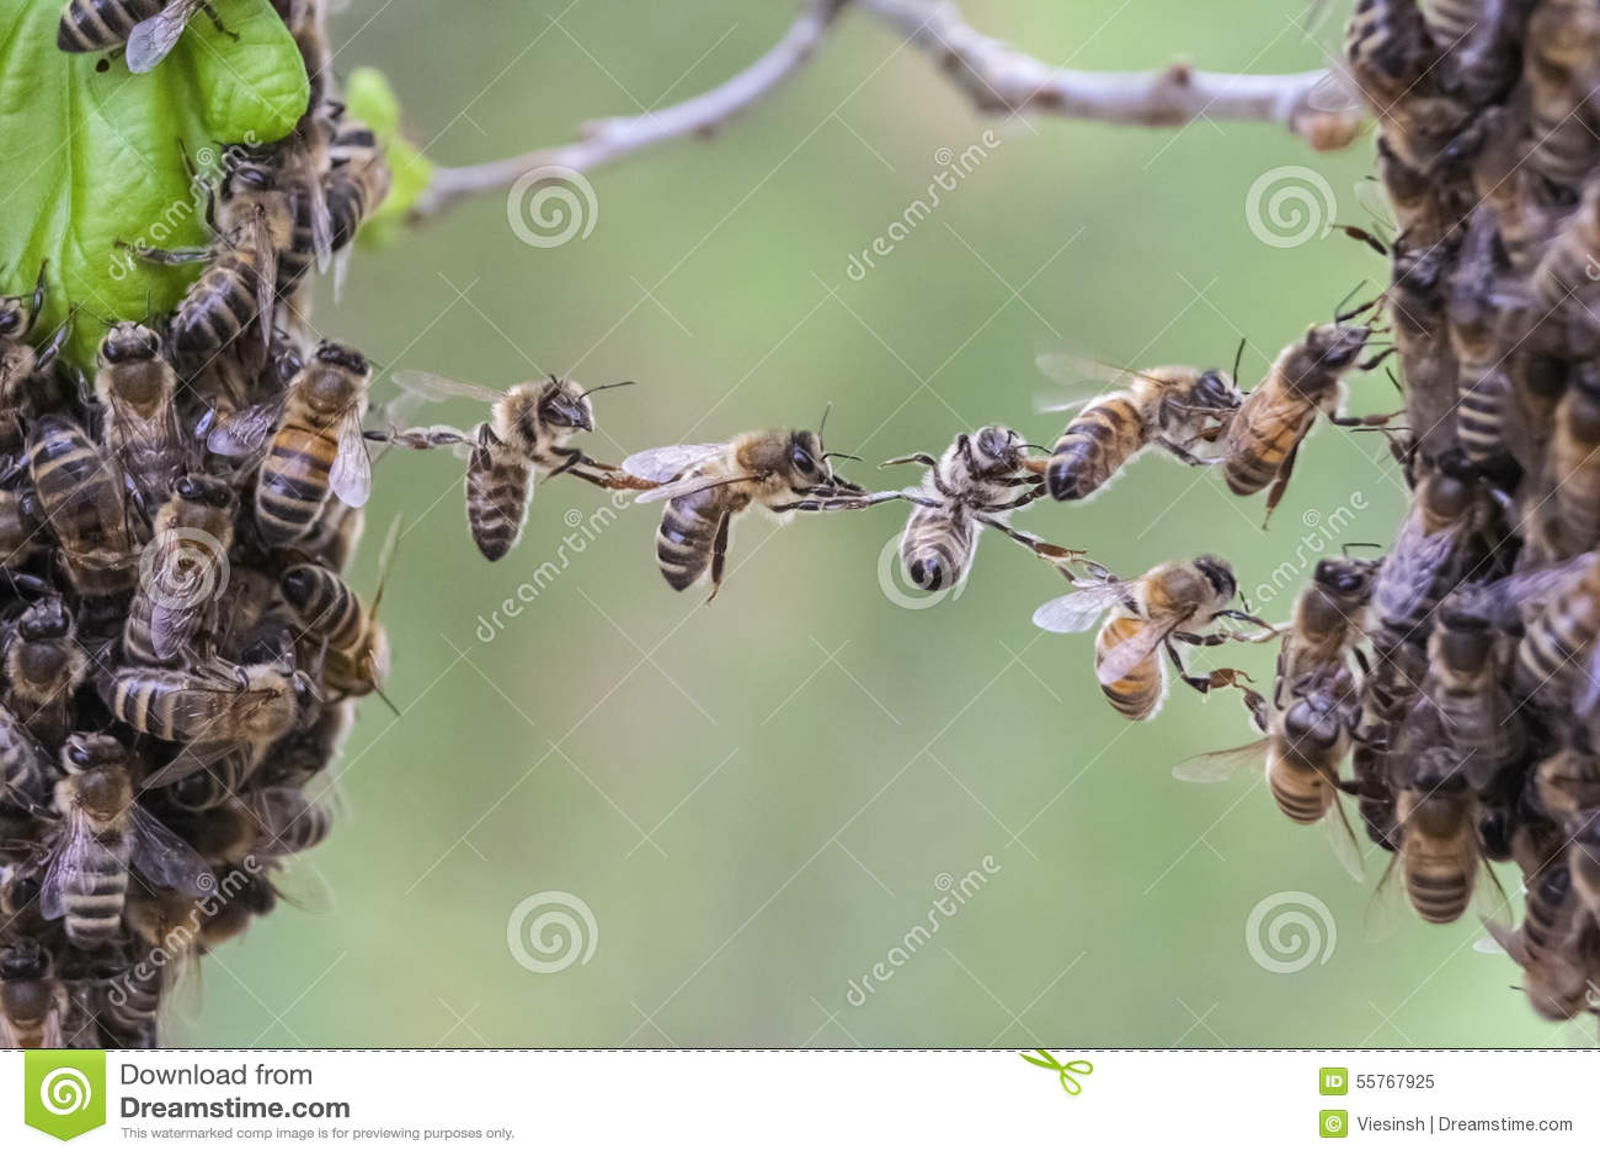 Teamwork of bees bridge a gap of two bee swarm parts.